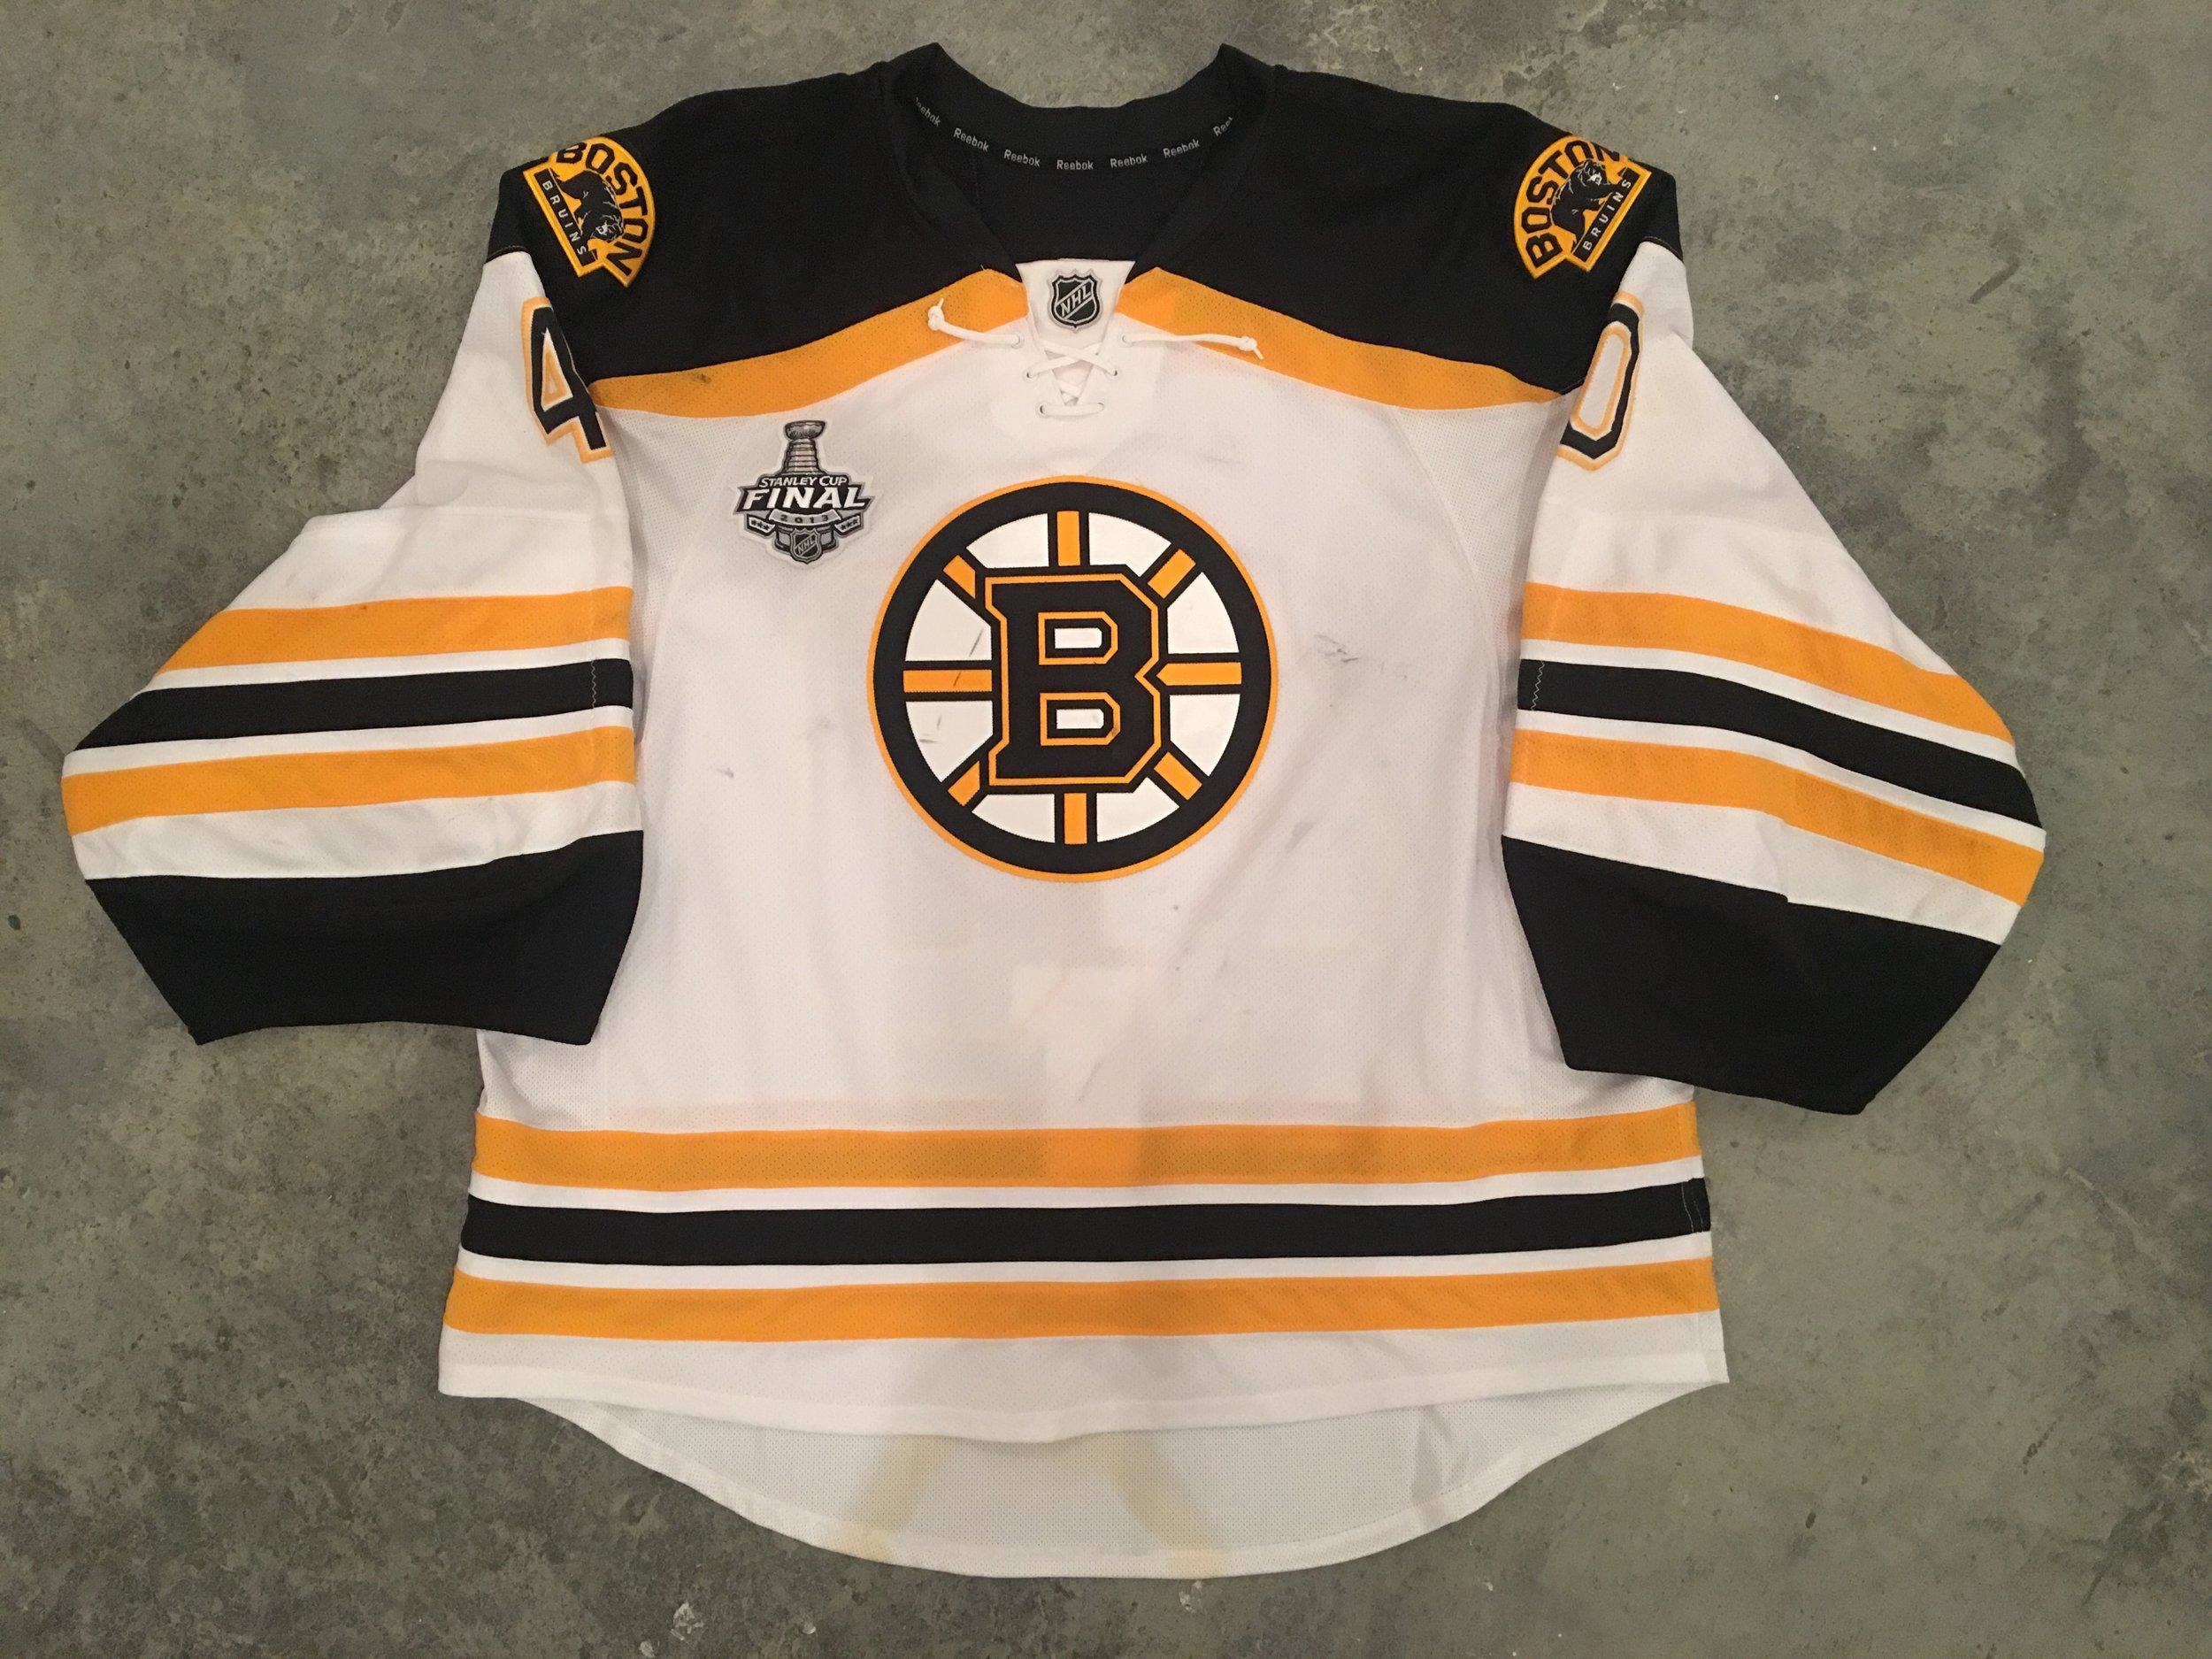 2013 Boston Bruins Stanley Cup Finals Game Worn Road Jersey - Tuuka Rask